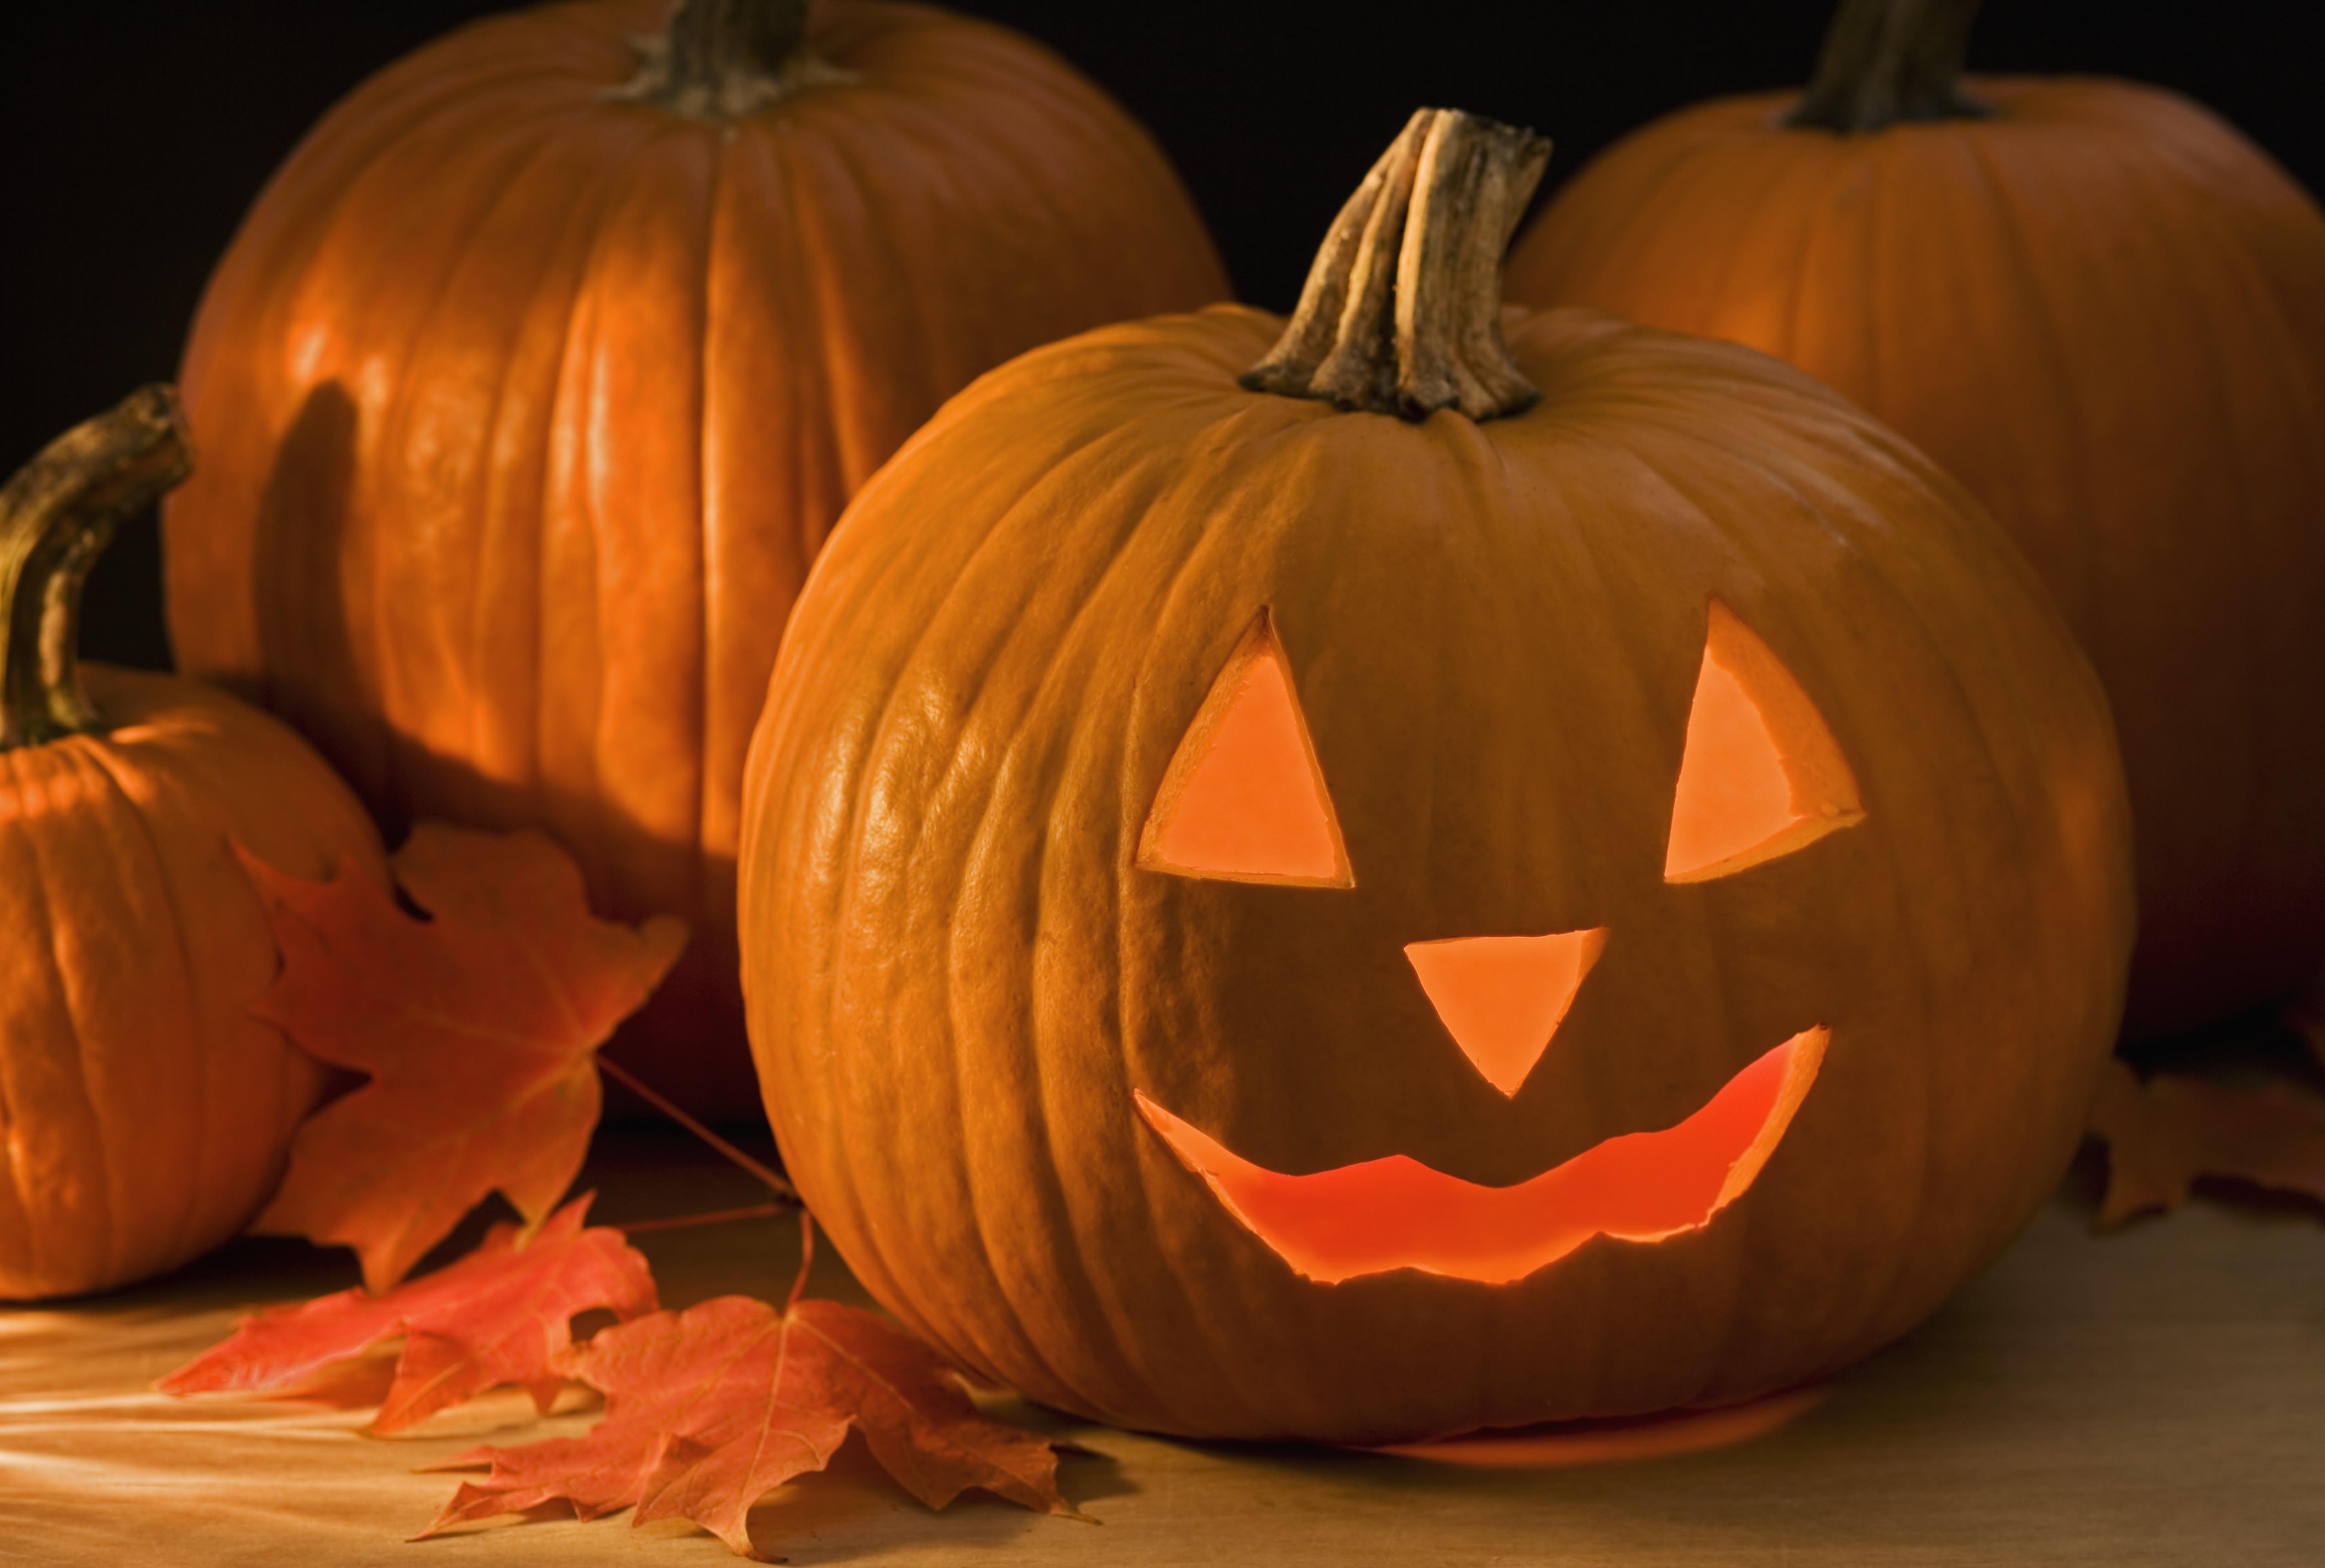 Uncategorized Halloween Jack O Lanterns still life of a jack o lantern 2 halloween pictures history olanterns tradition pumpkins carving pumpkins